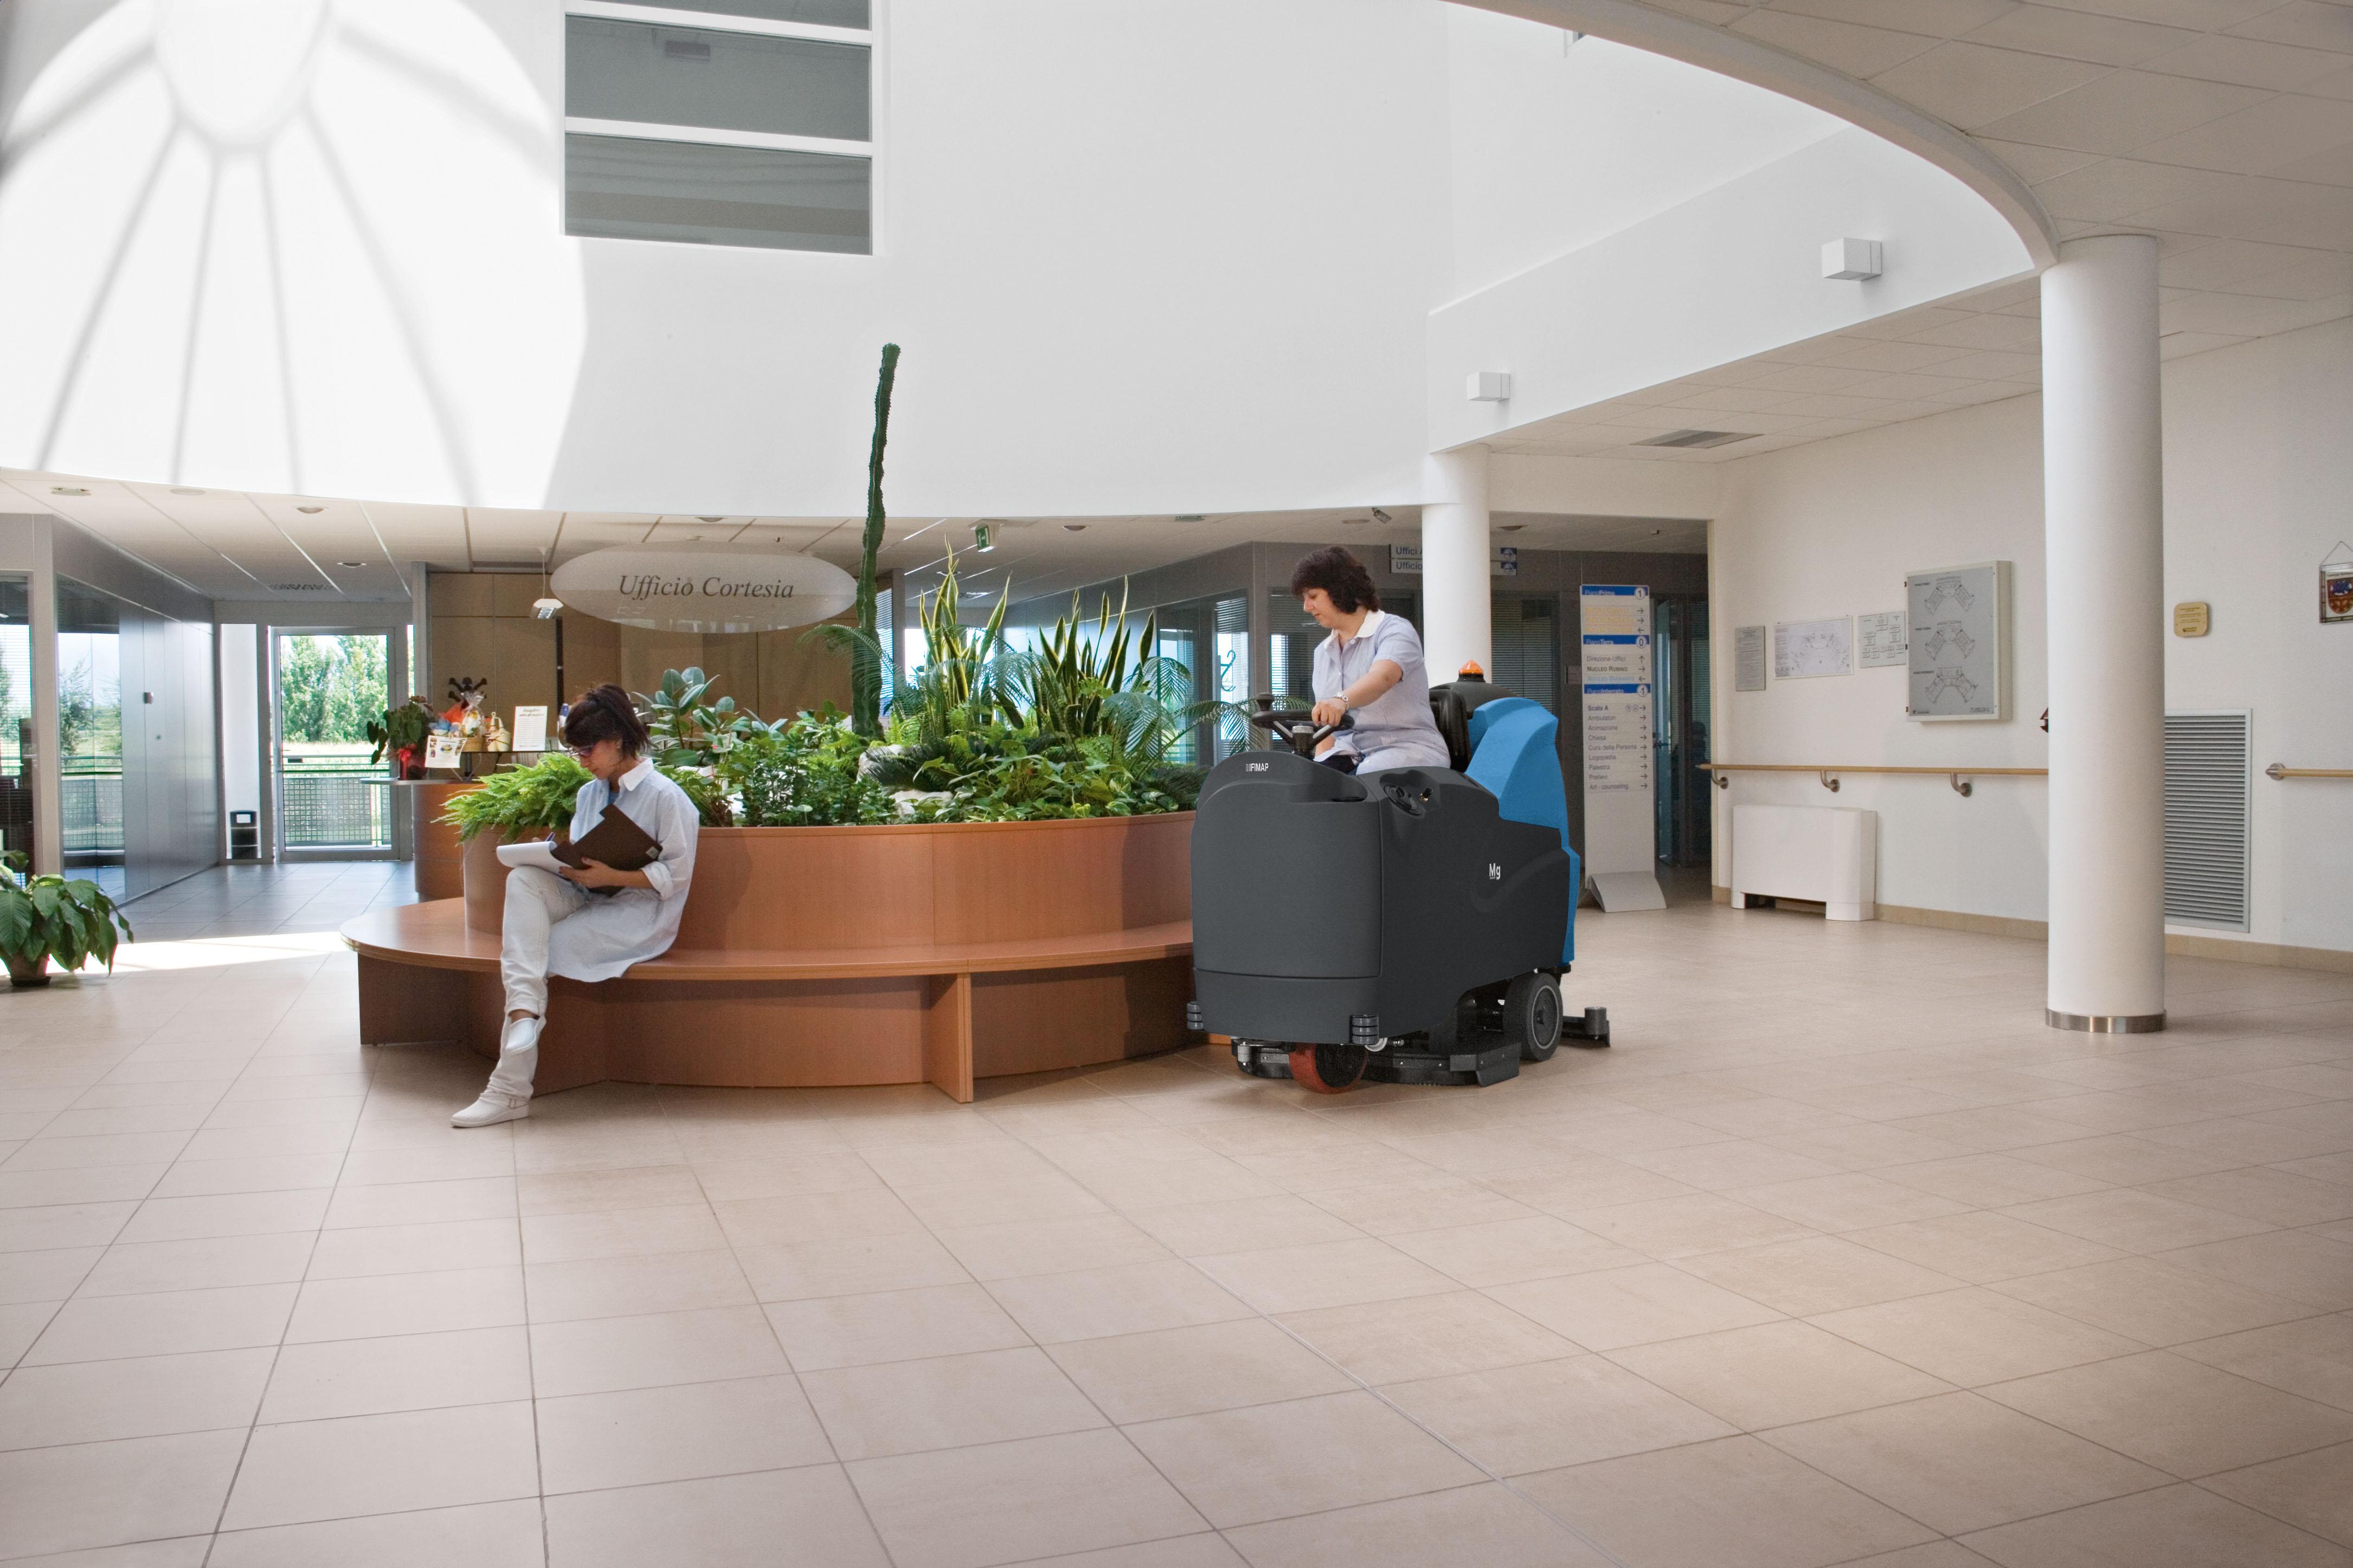 004 MG85 B Hospital Bi_C